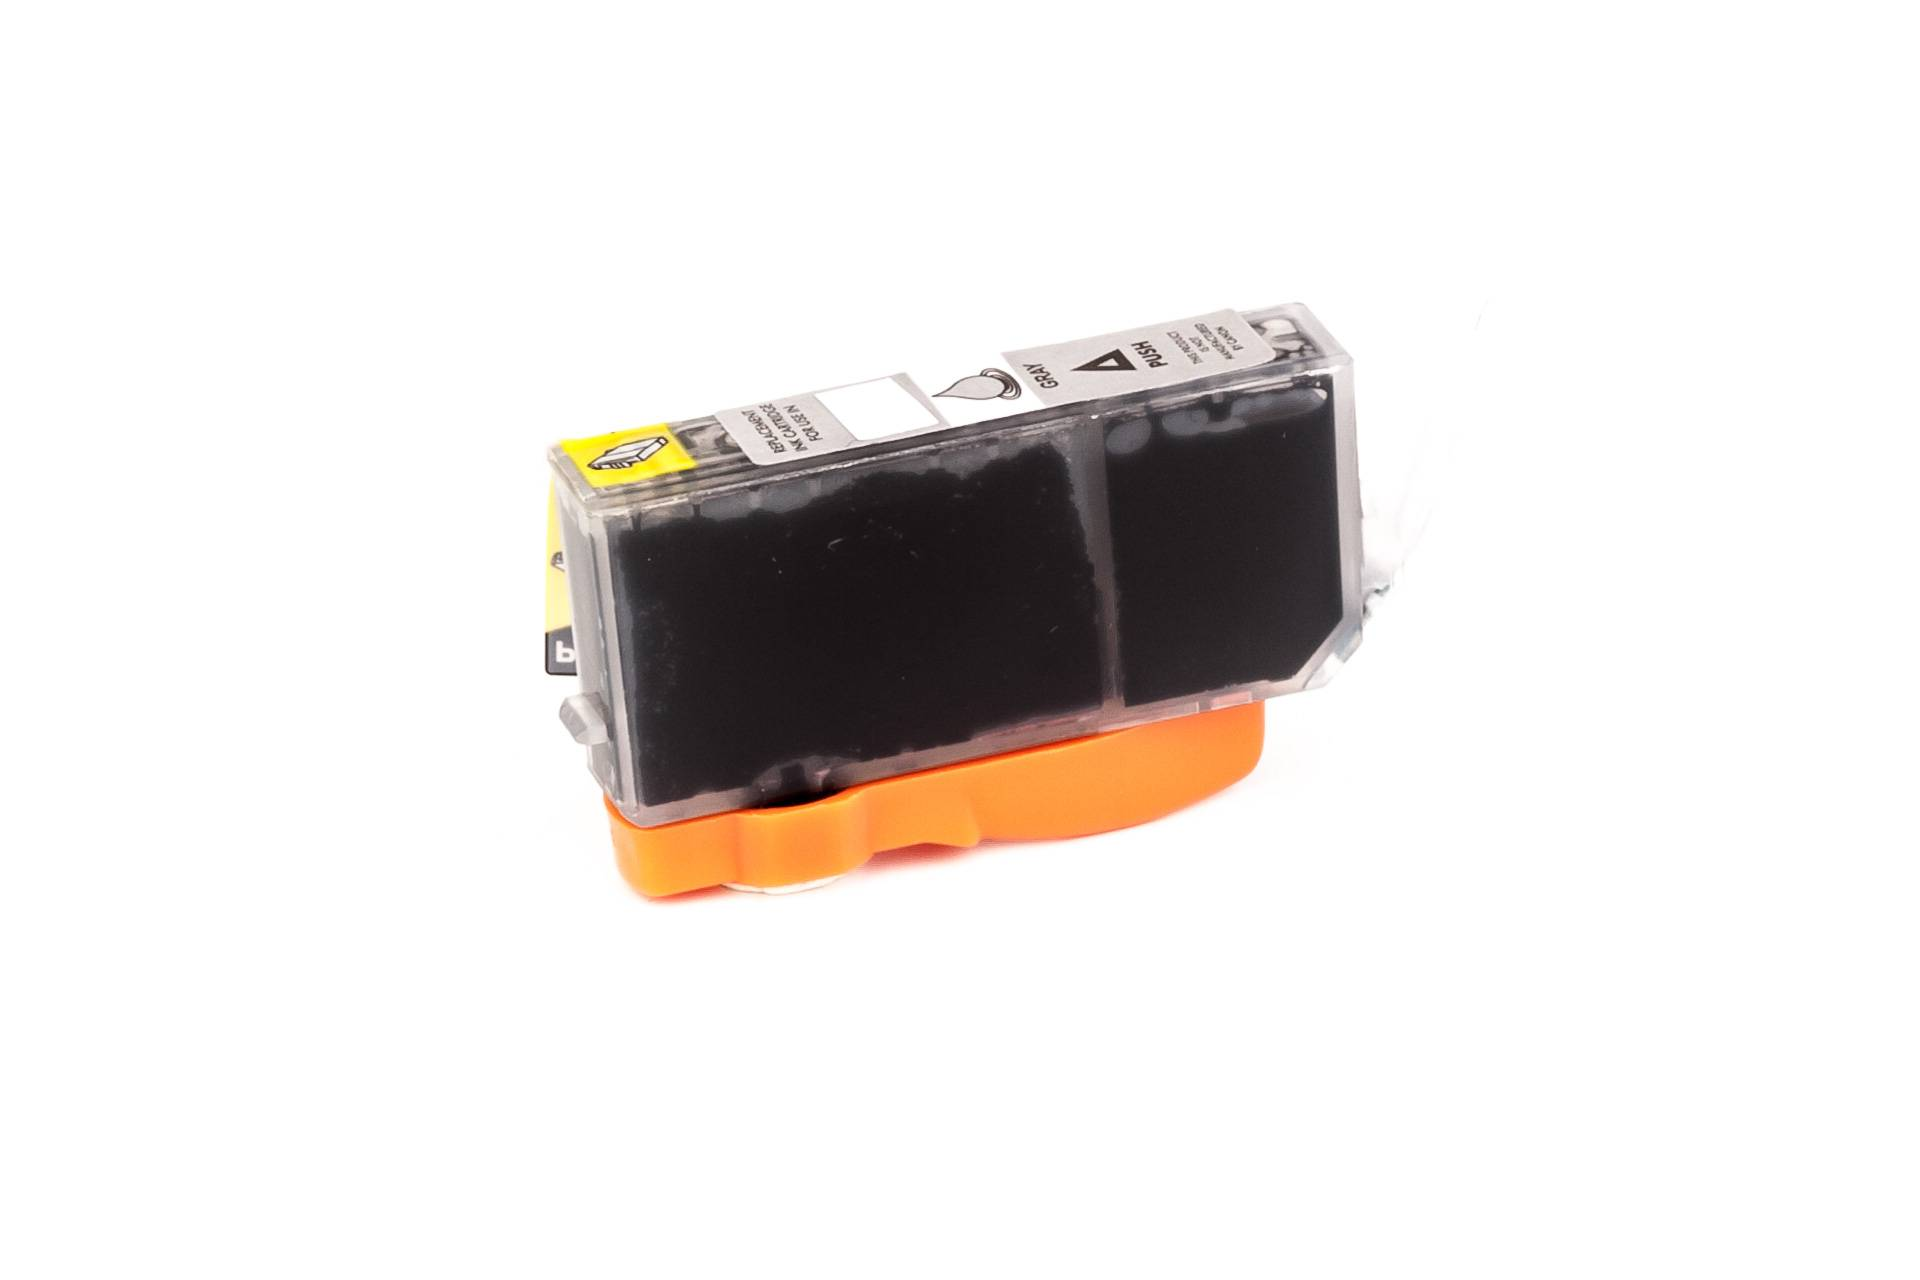 Canon Cartouche d'encre pour Canon 2937B001 / CLI-521 GY gris compatible (de marque ASC)